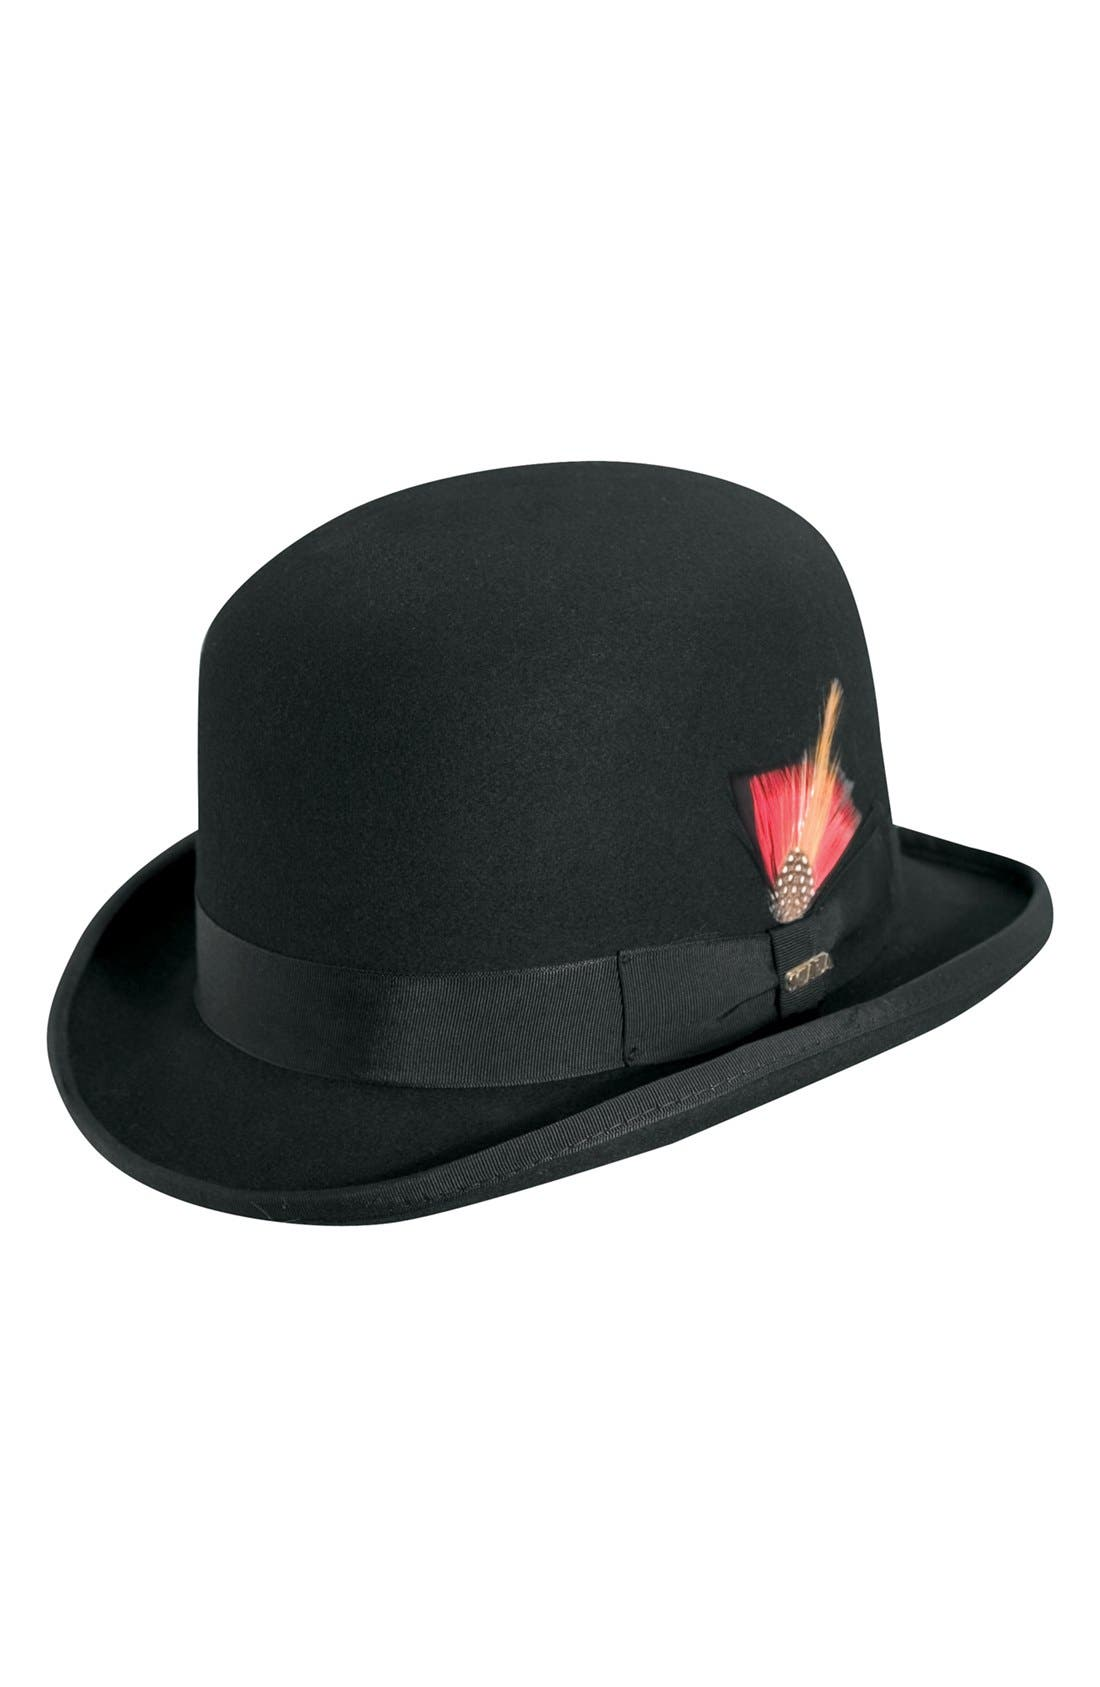 'Classico' Wool Felt Derby Hat,                         Main,                         color, BLACK